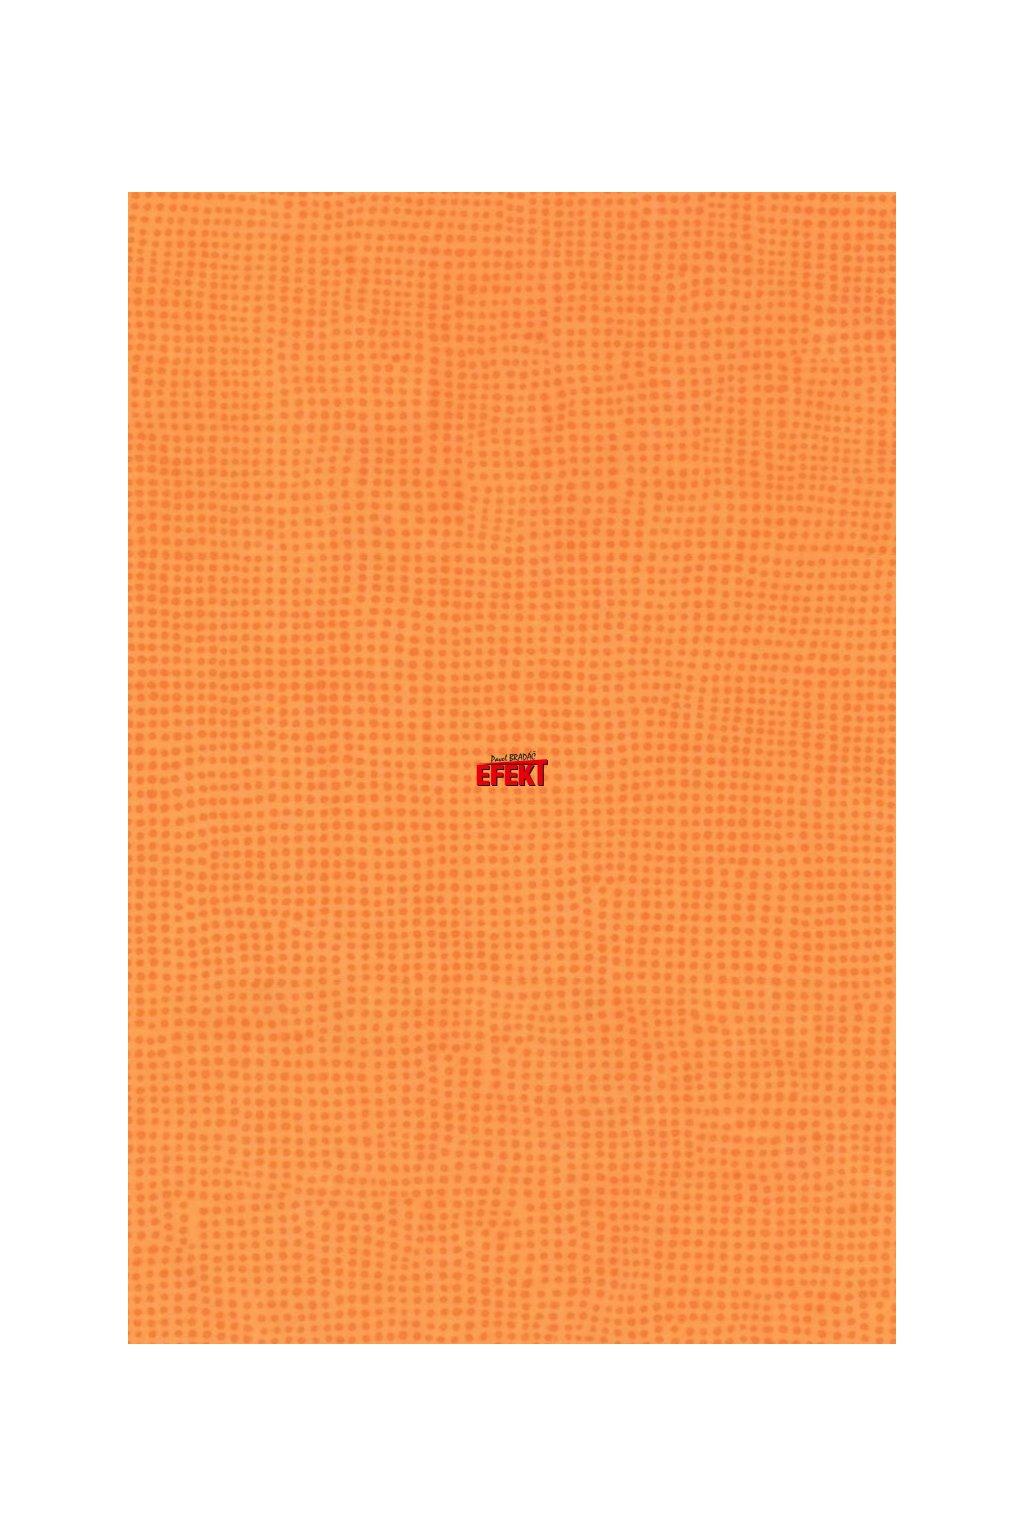 Diversion Clementine 0600